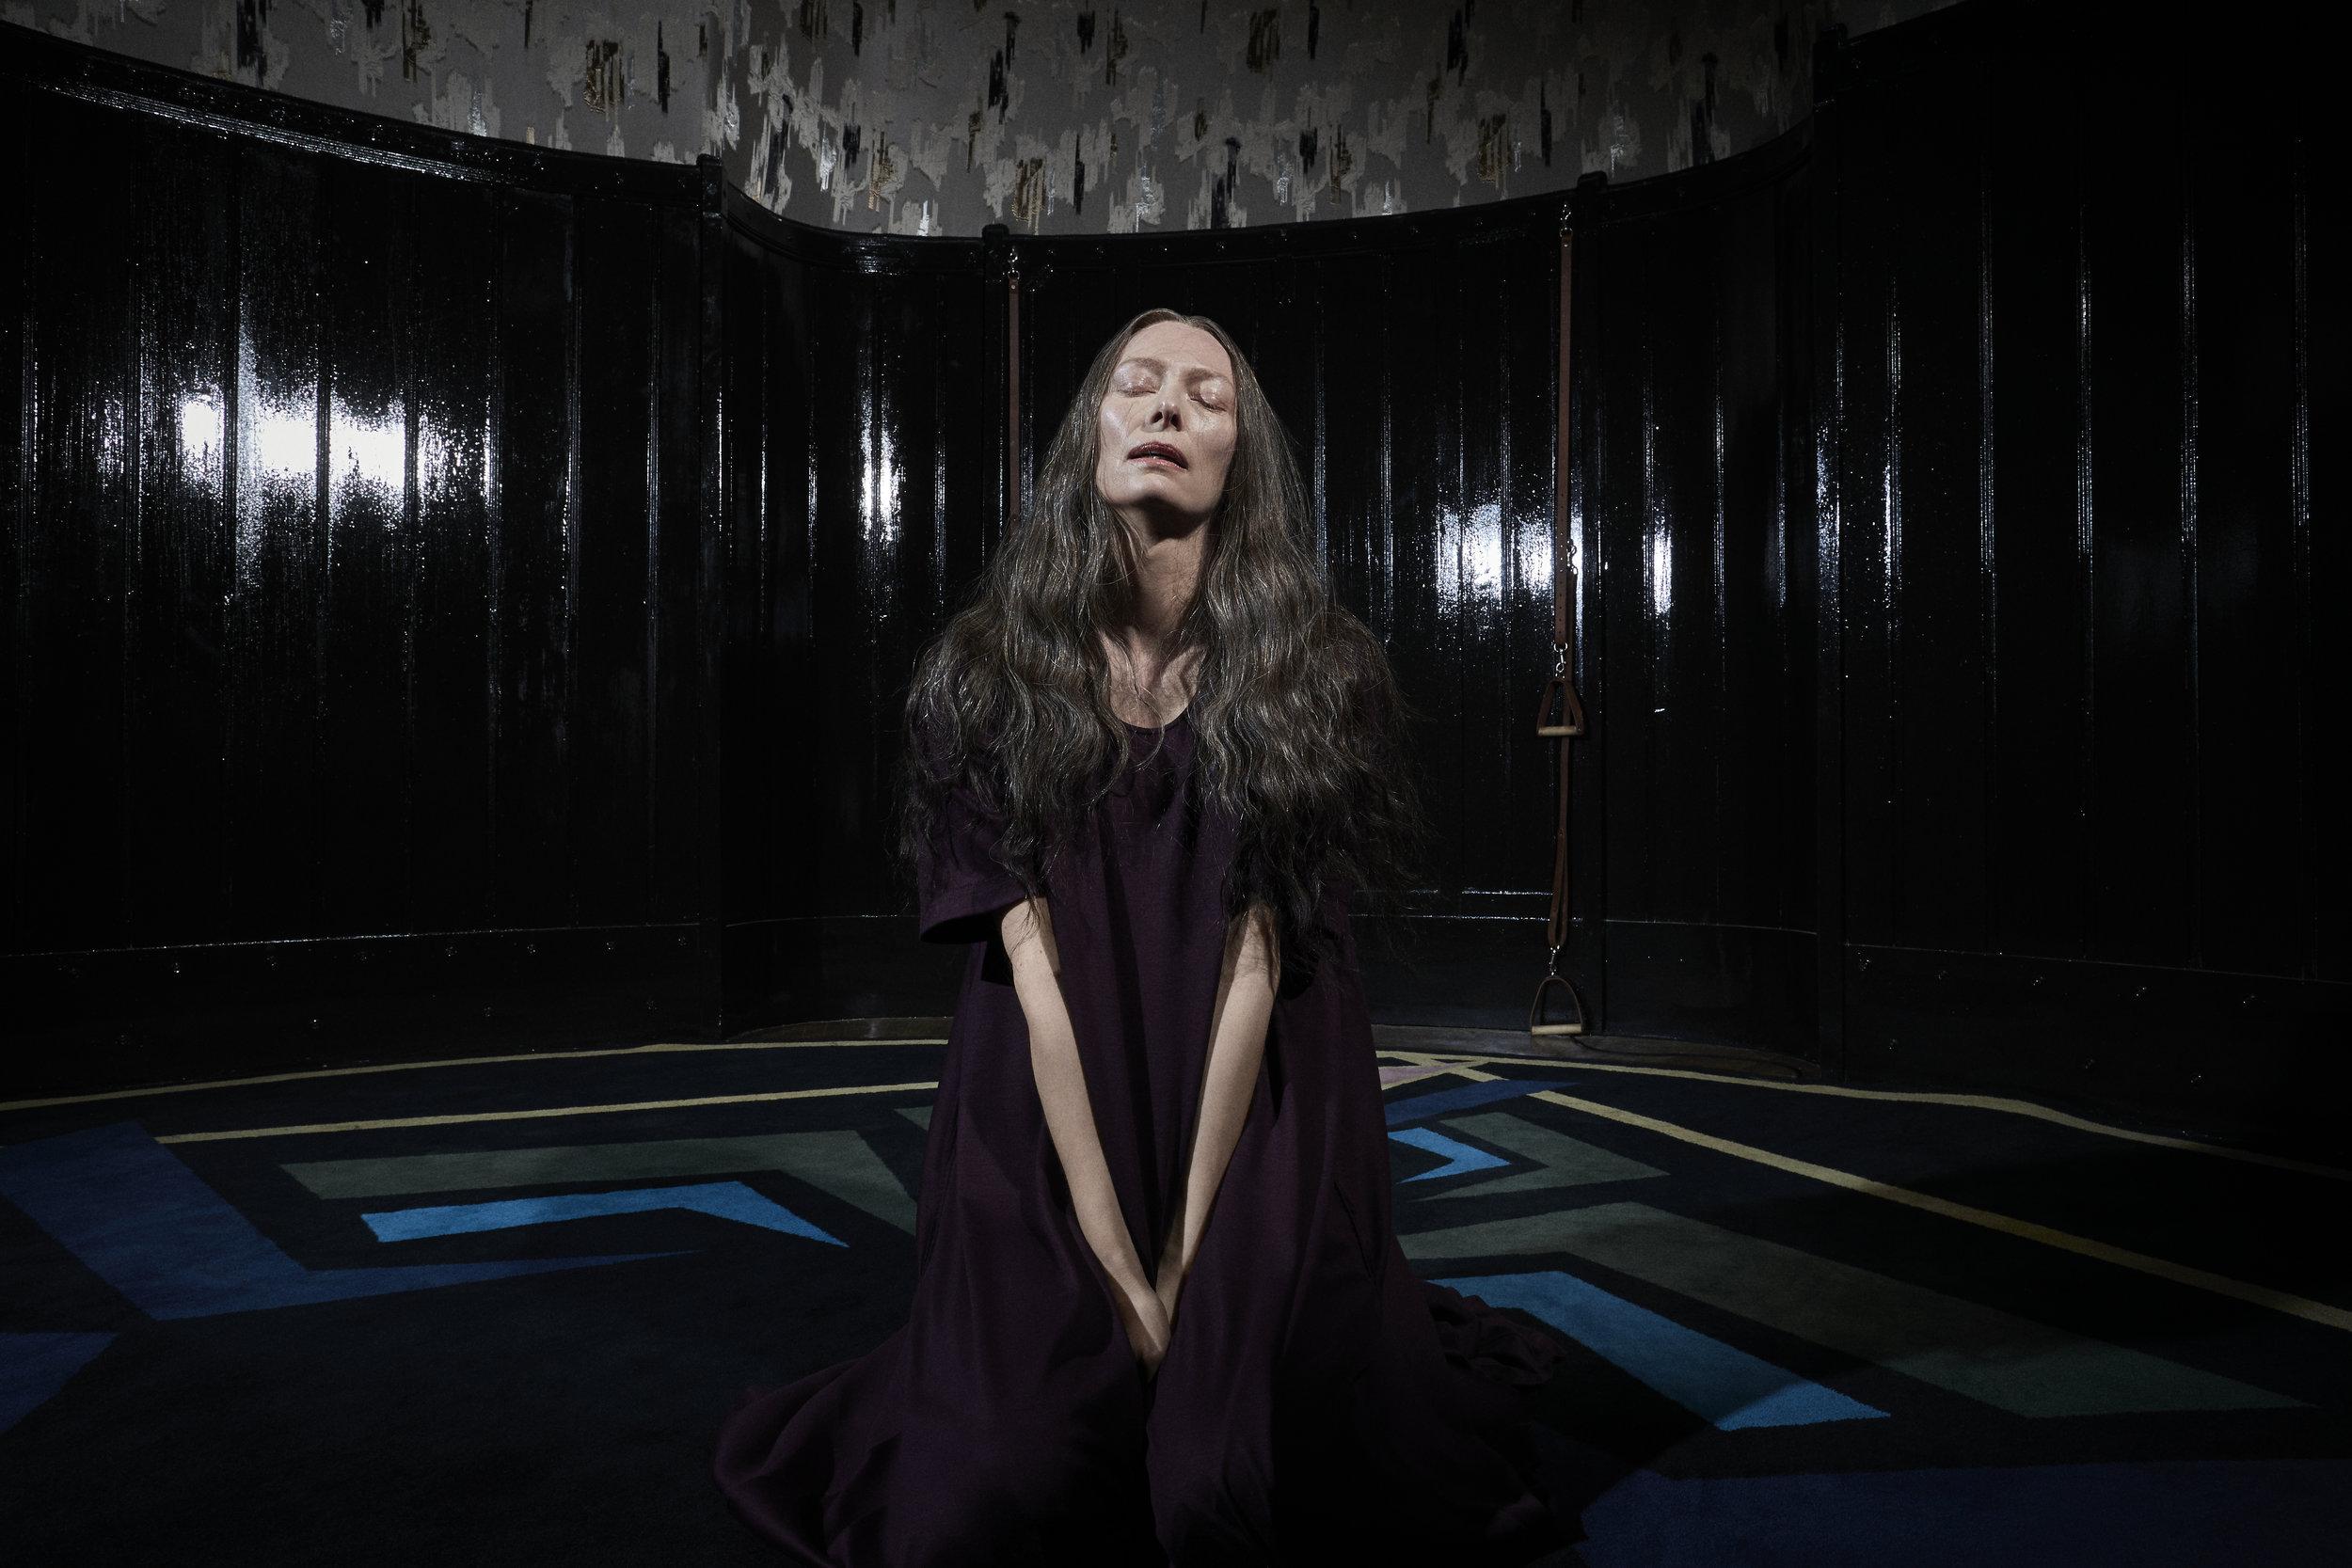 Tilda Swinton plays three parts in Suspiria; she's most recognizable in this one. (Amazon)